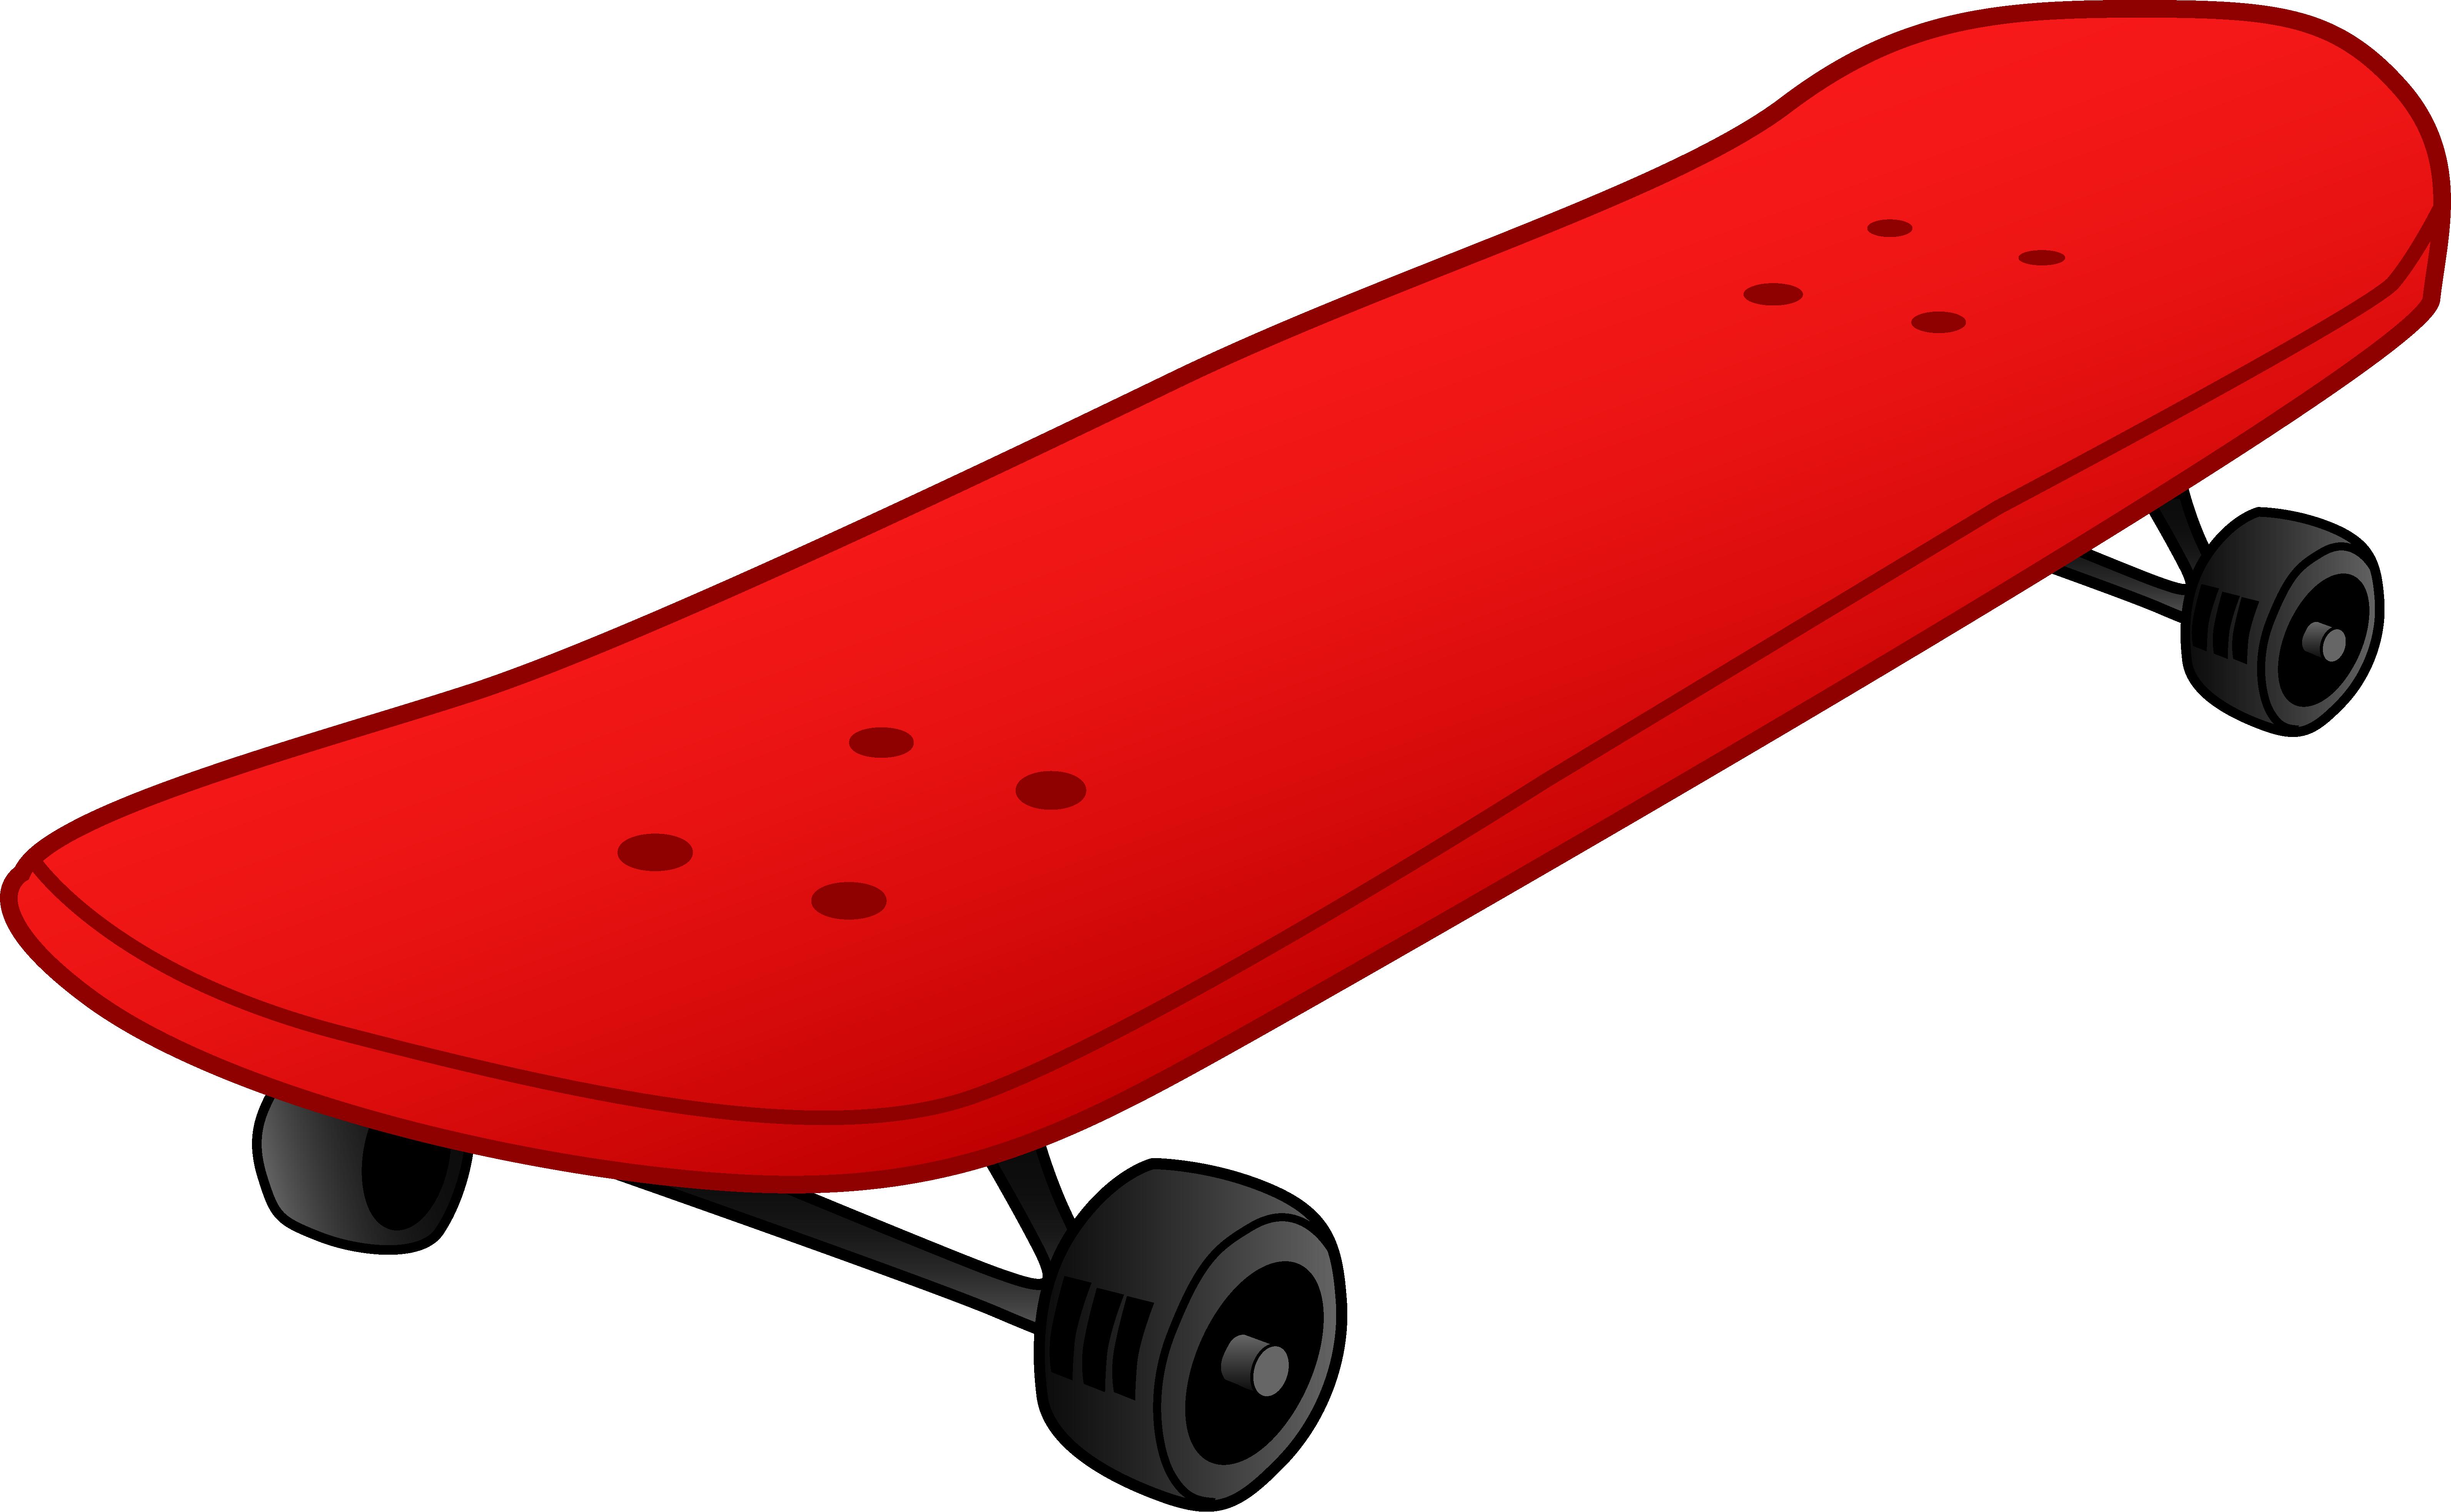 Skateboard designs clipart clip art black and white Skateboard PNG Images Transparent Free Download | PNGMart.com clip art black and white